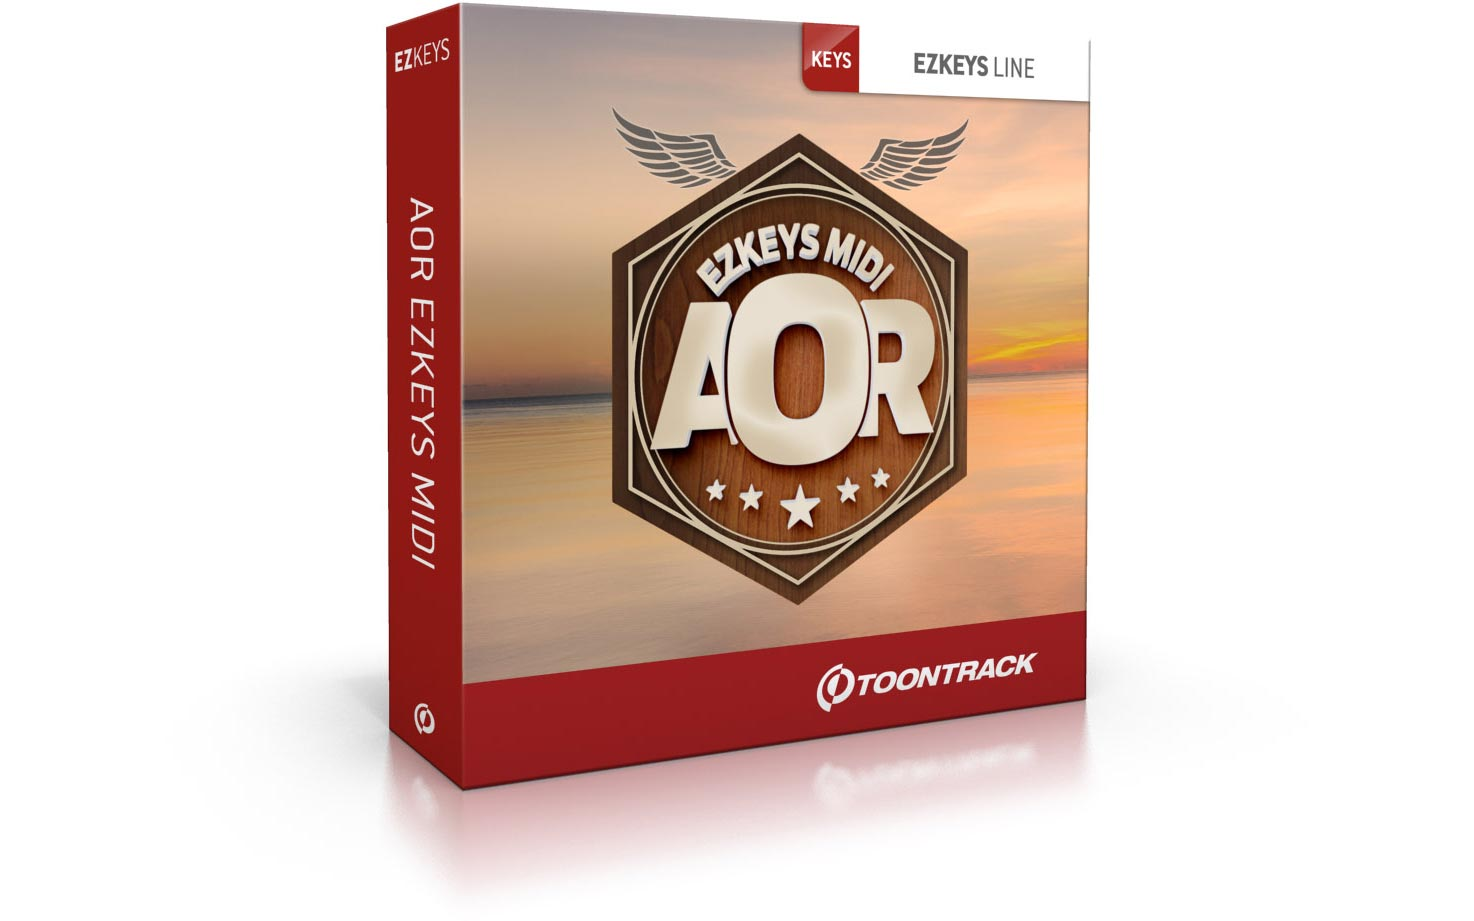 toontrack-ezkeys-aor-midi-pack-download-